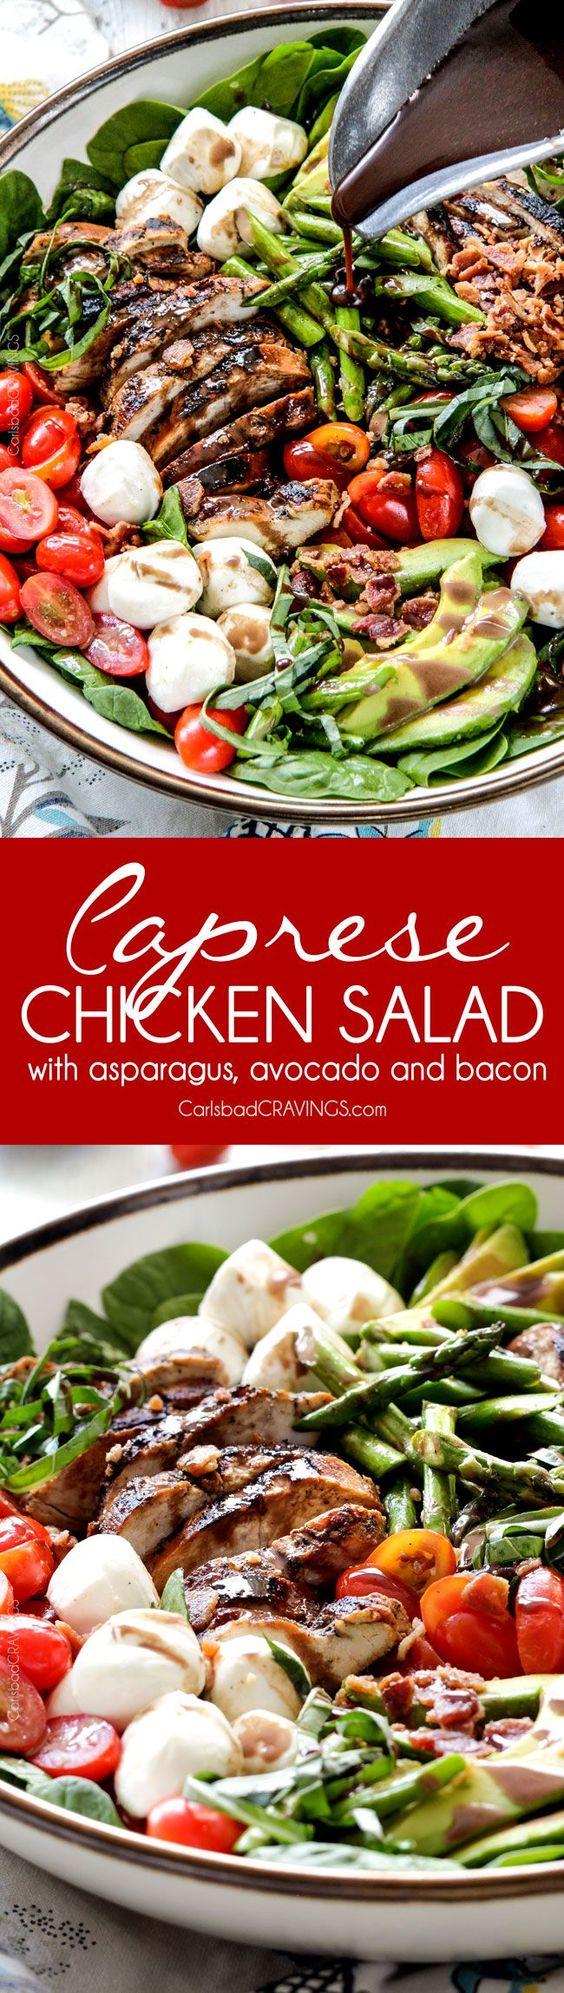 ... tomatoes fresh world chicken salad recipes salad recipes recipe the o